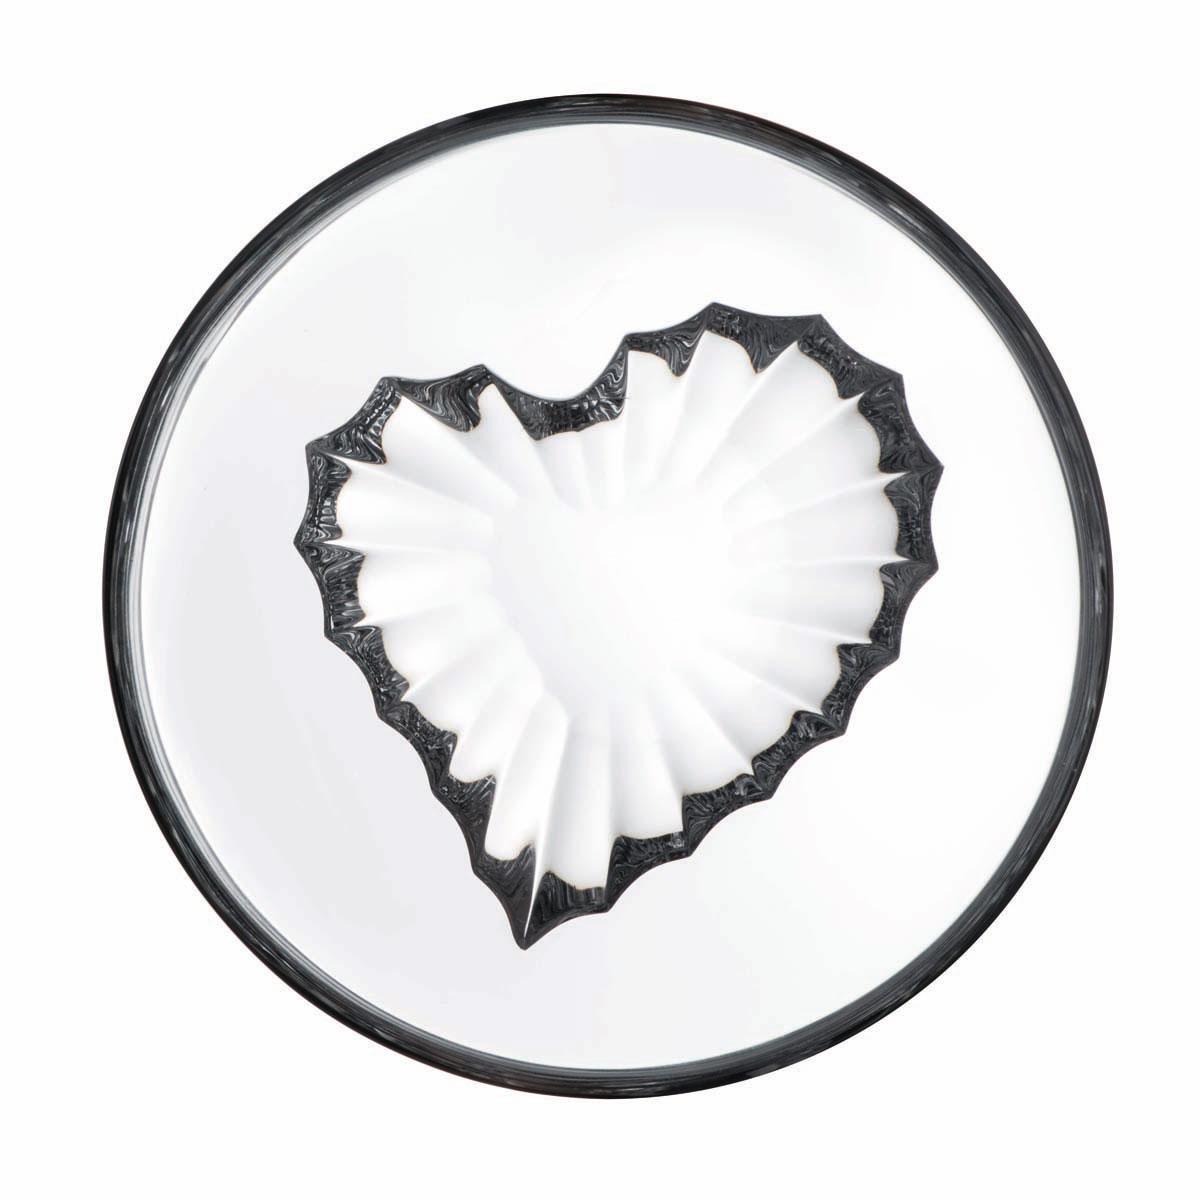 Rogaska Crystal, Live, Love, Sparkle Mini Crystal Bowl, Heart